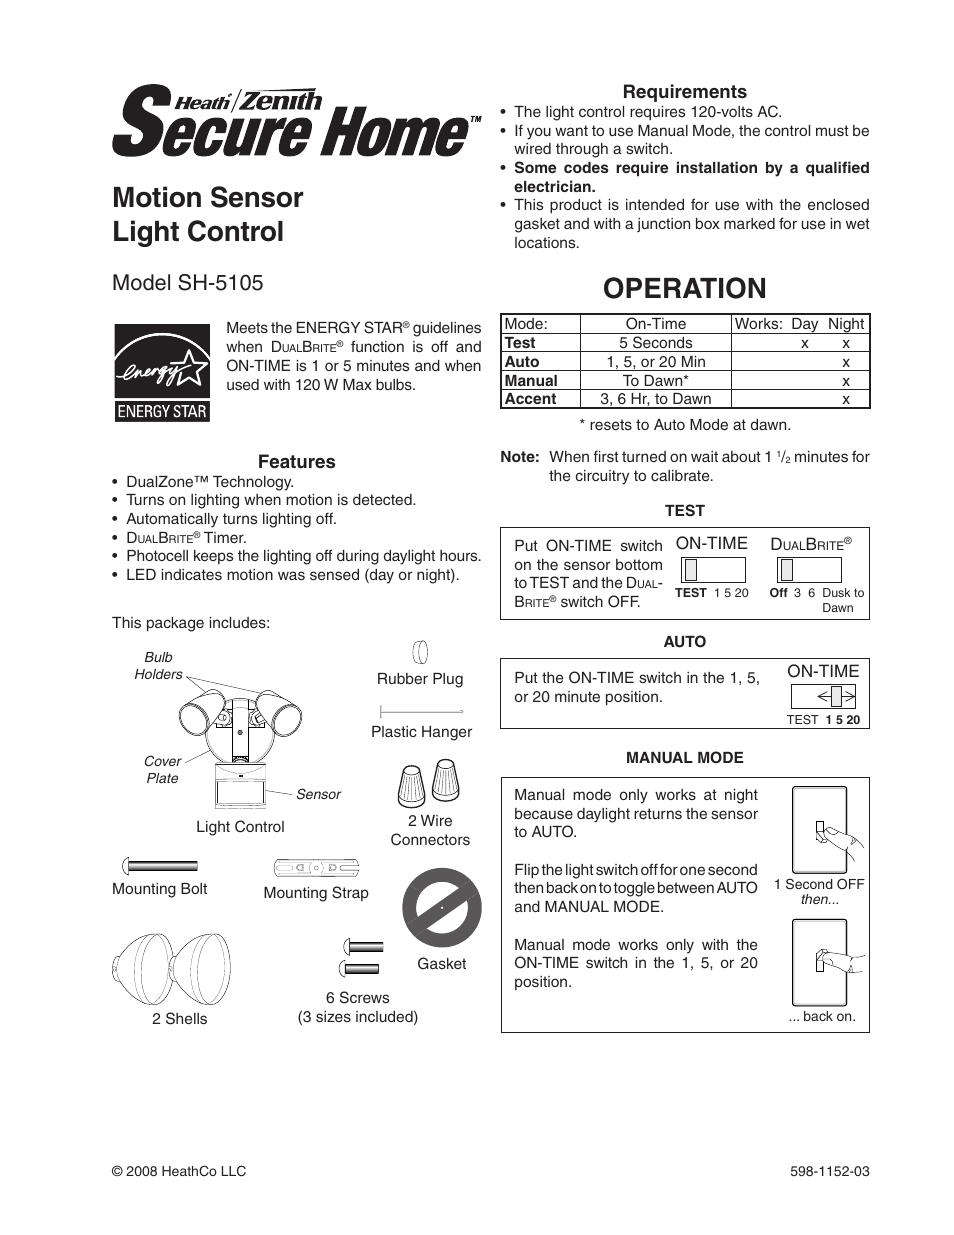 Heath Zenith Motion Sensor Light Control Sh 5105 User Manual 20 Pages